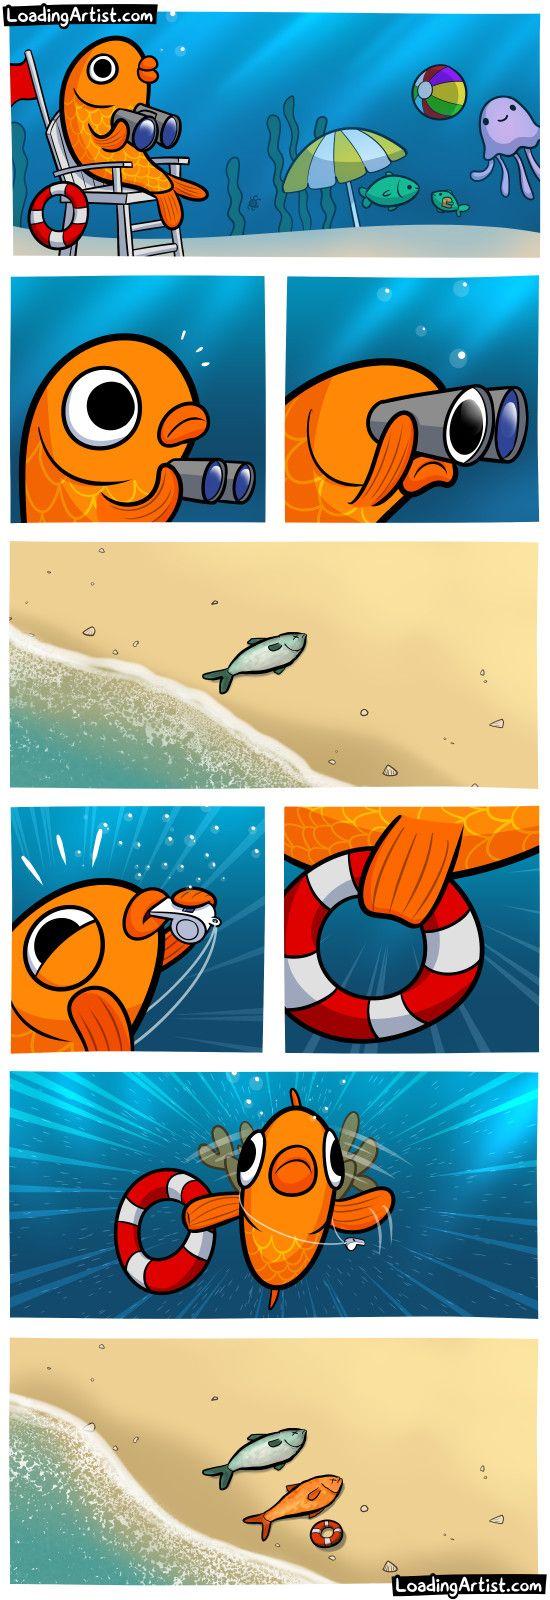 best 25 funny fish ideas only on pinterest dumb funny jokes